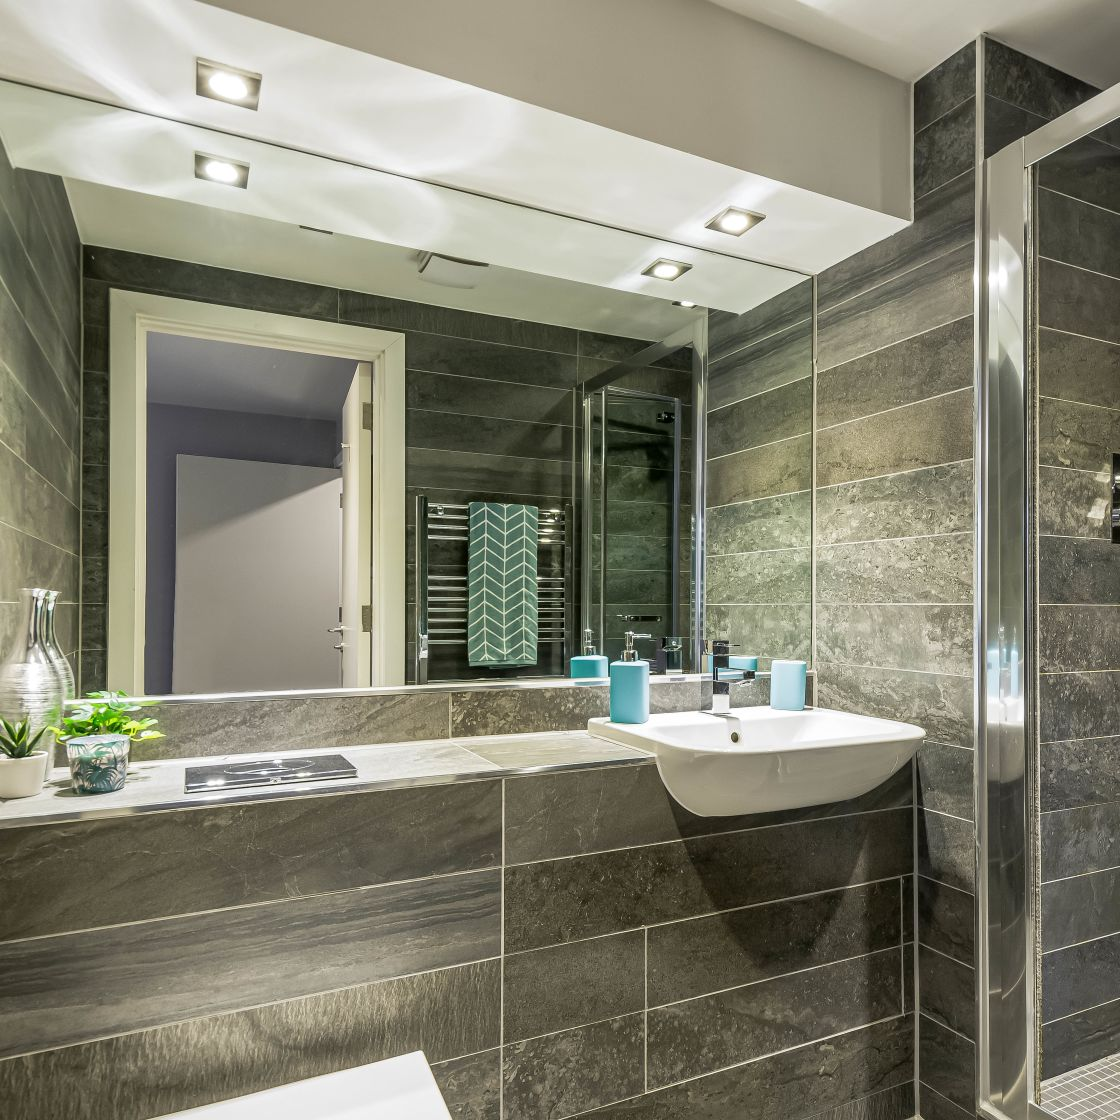 Grande Student Apartment in Leeds En-suite Bathroom with Shower. IconInc, The Edge